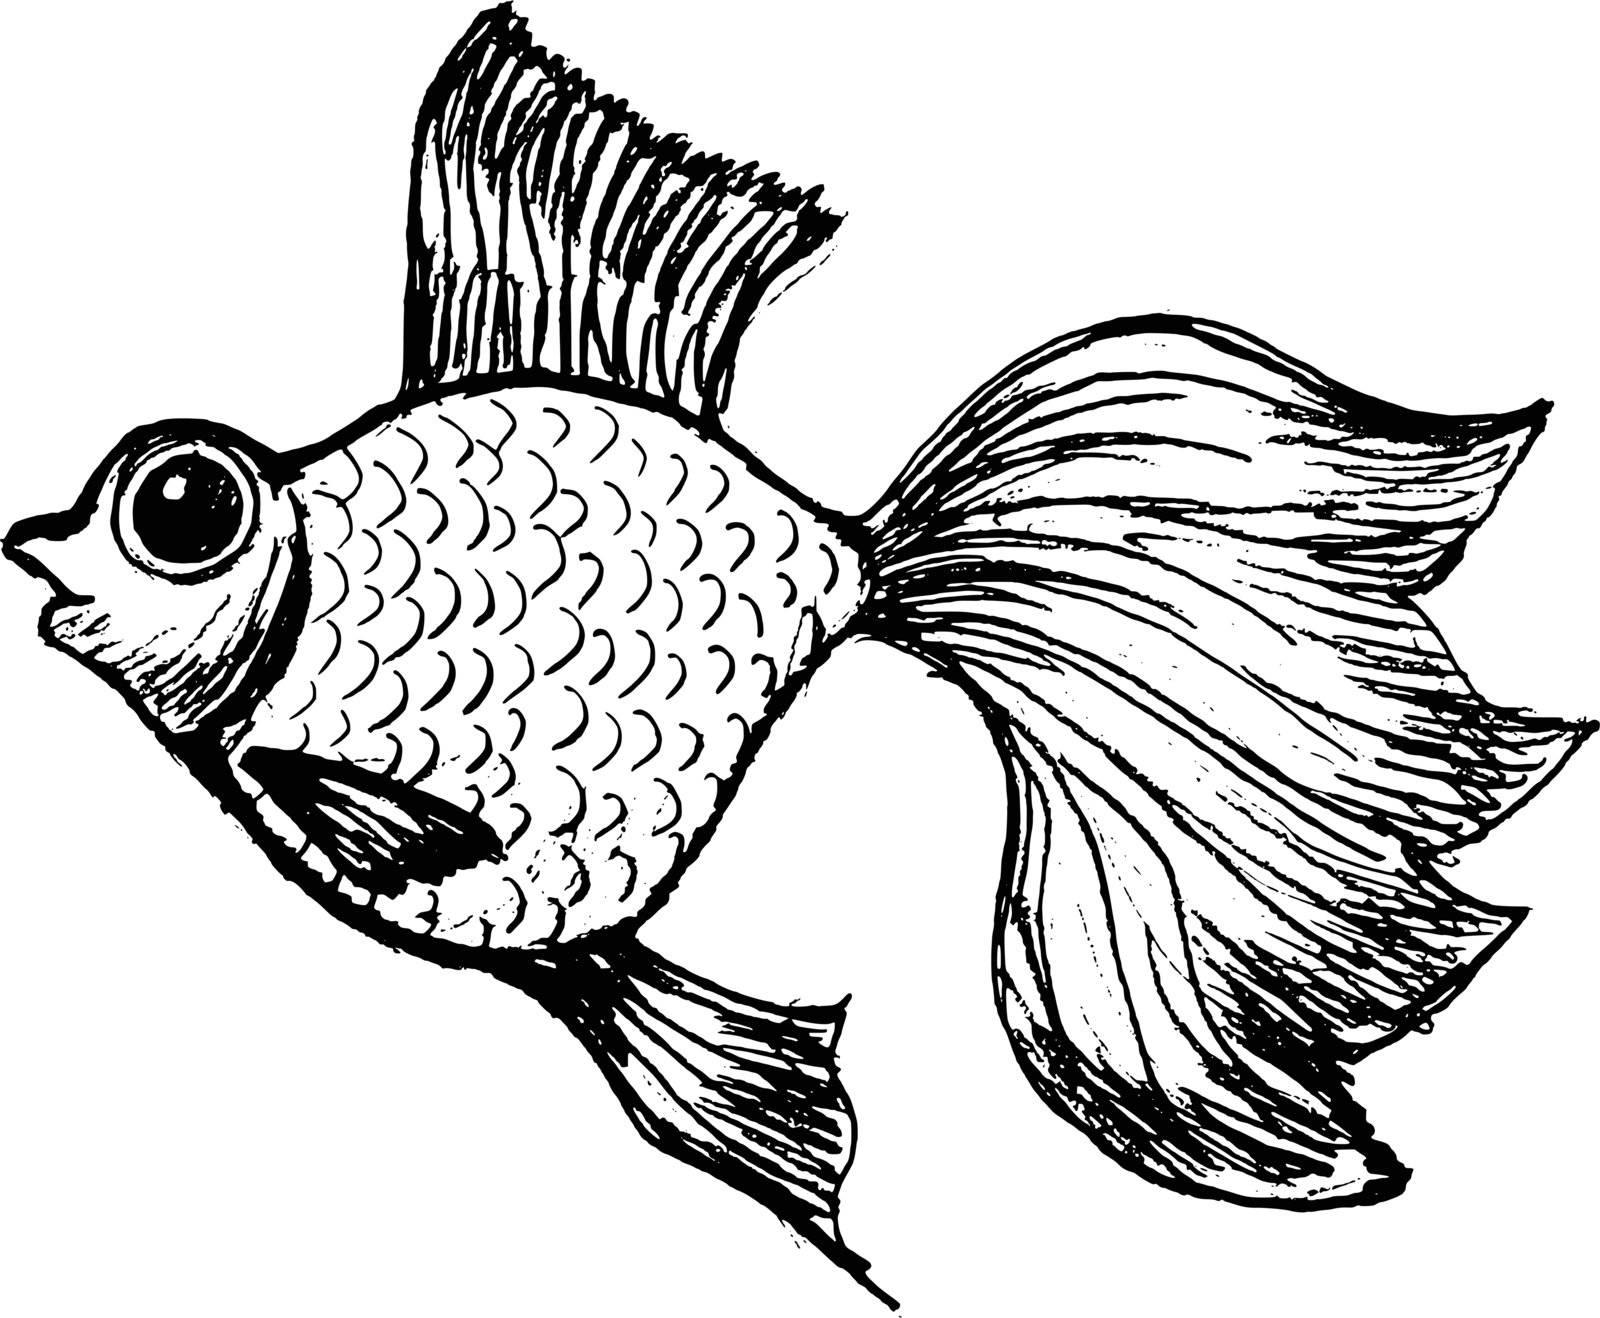 goldfish by Perysty